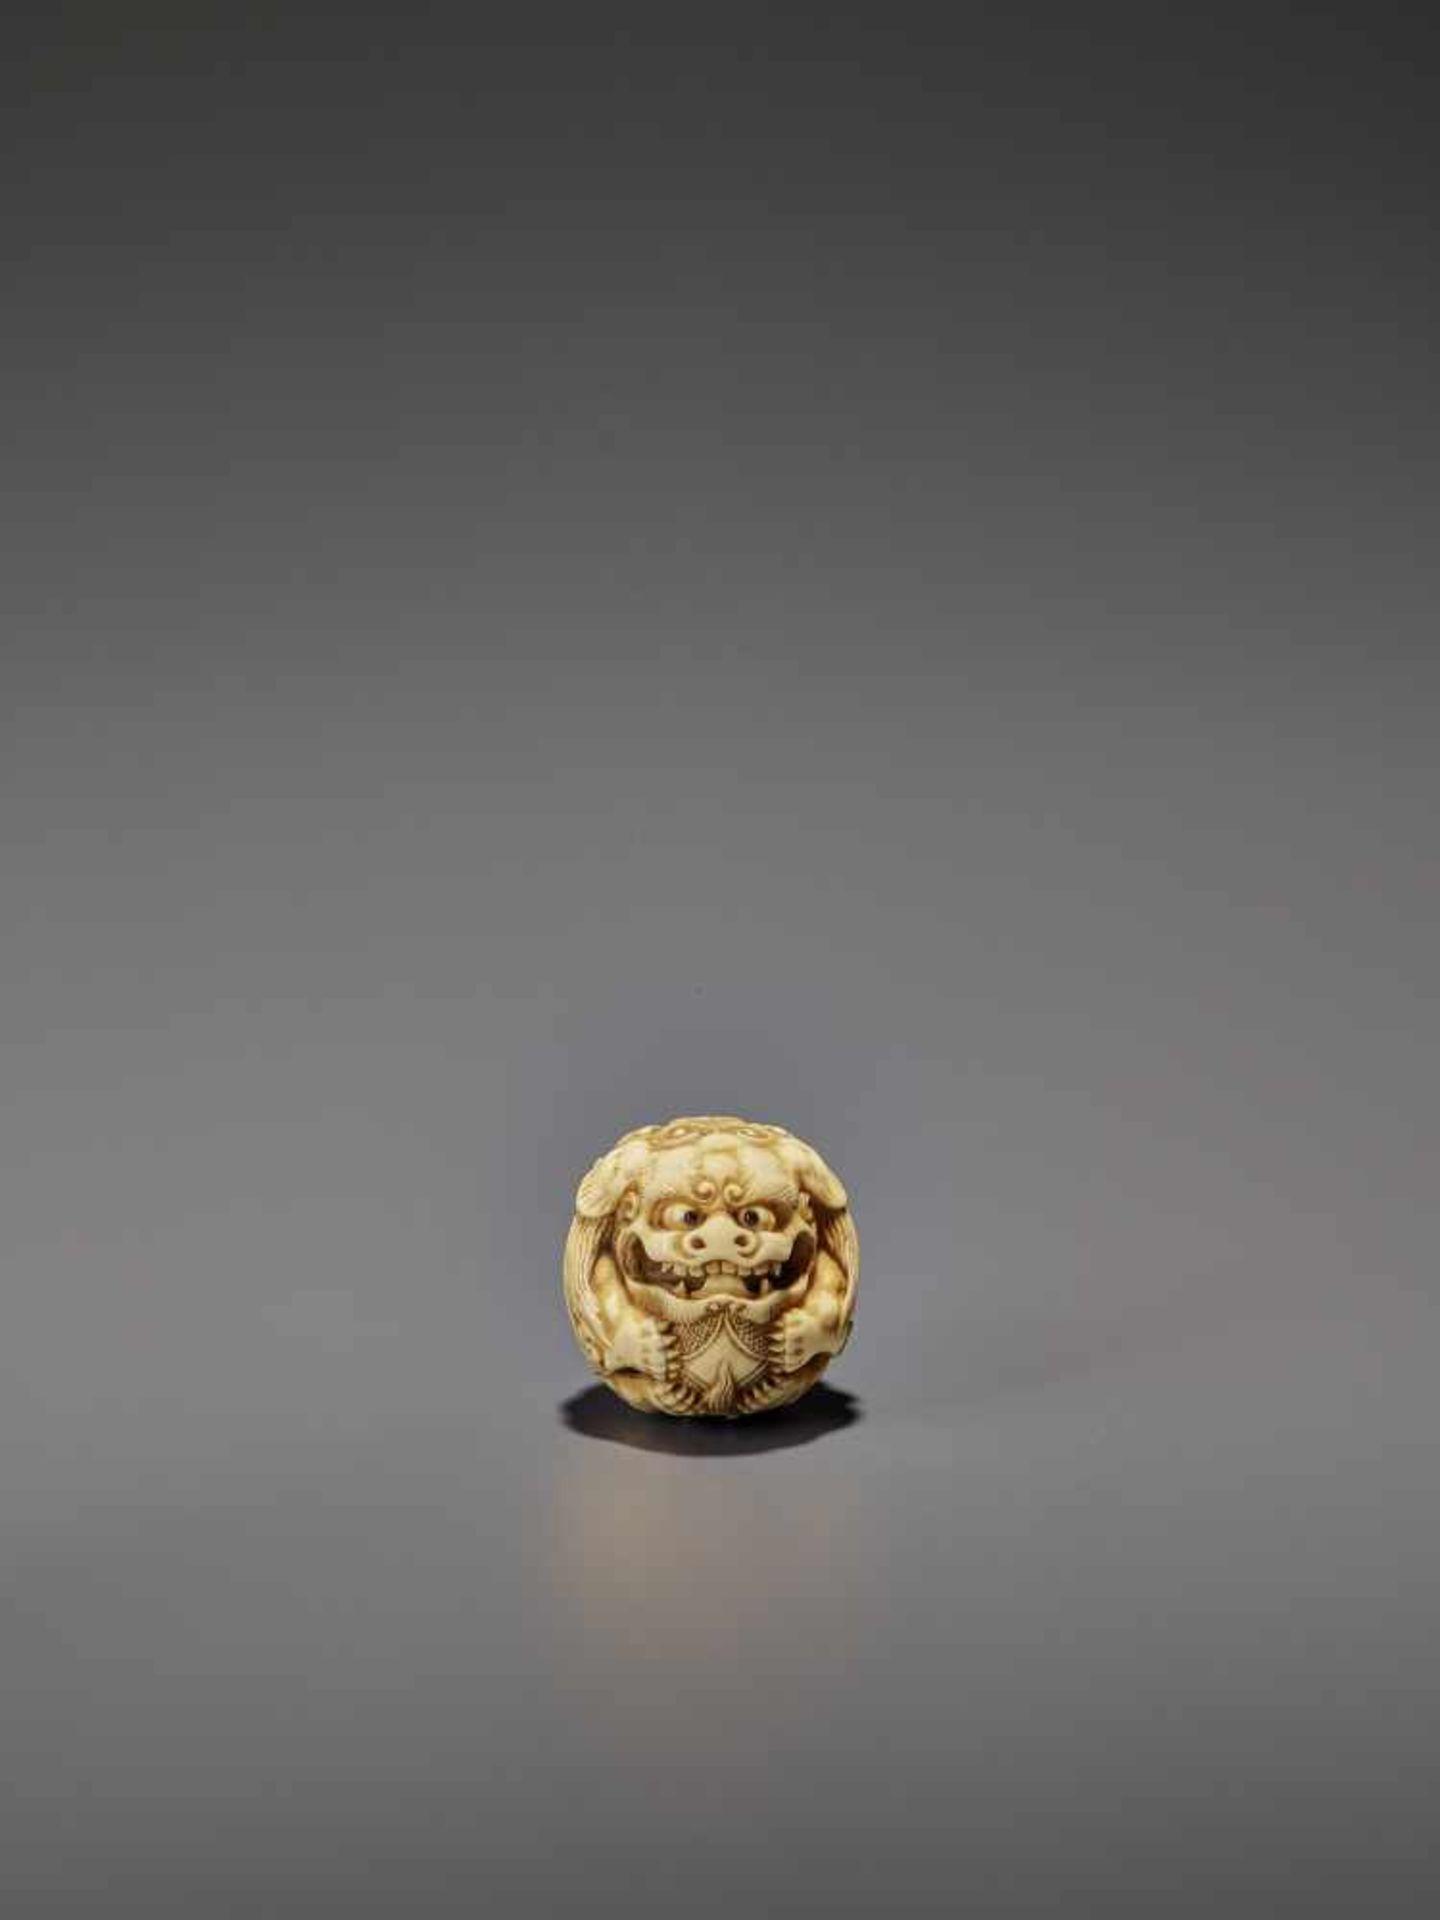 AN IVORY NETSUKE OF A SHISHI ROLLED INTO A BALL UnsignedJapan, 19th century, Edo period (1615-1868)